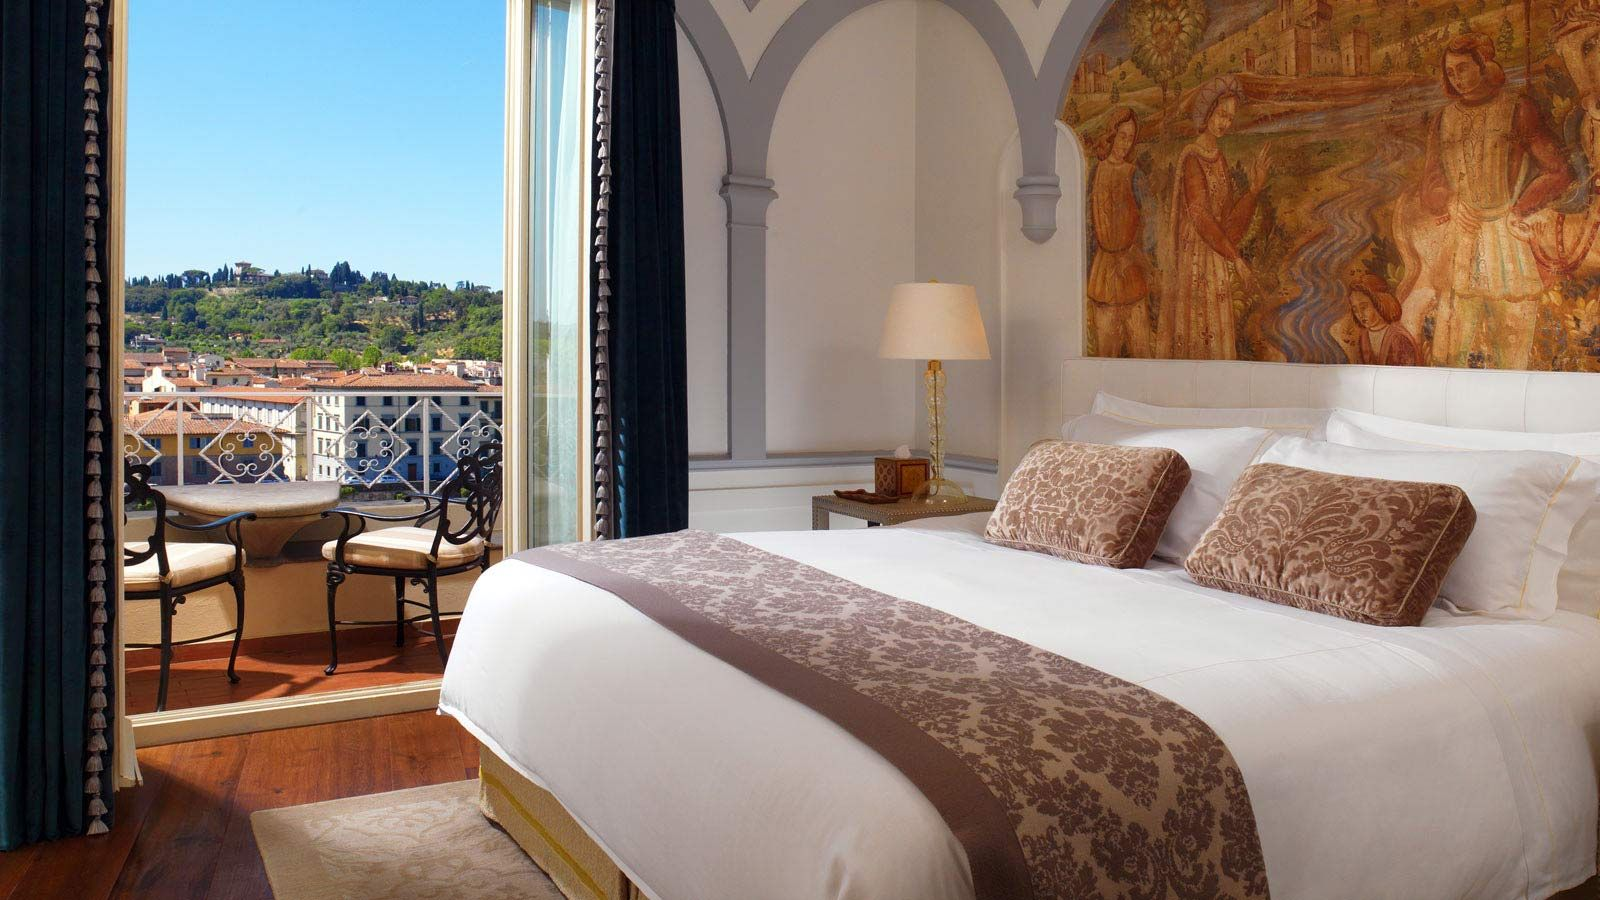 10*10 bedroom interior st regis hotel piazza ognissanti   firenze fi ital  italy